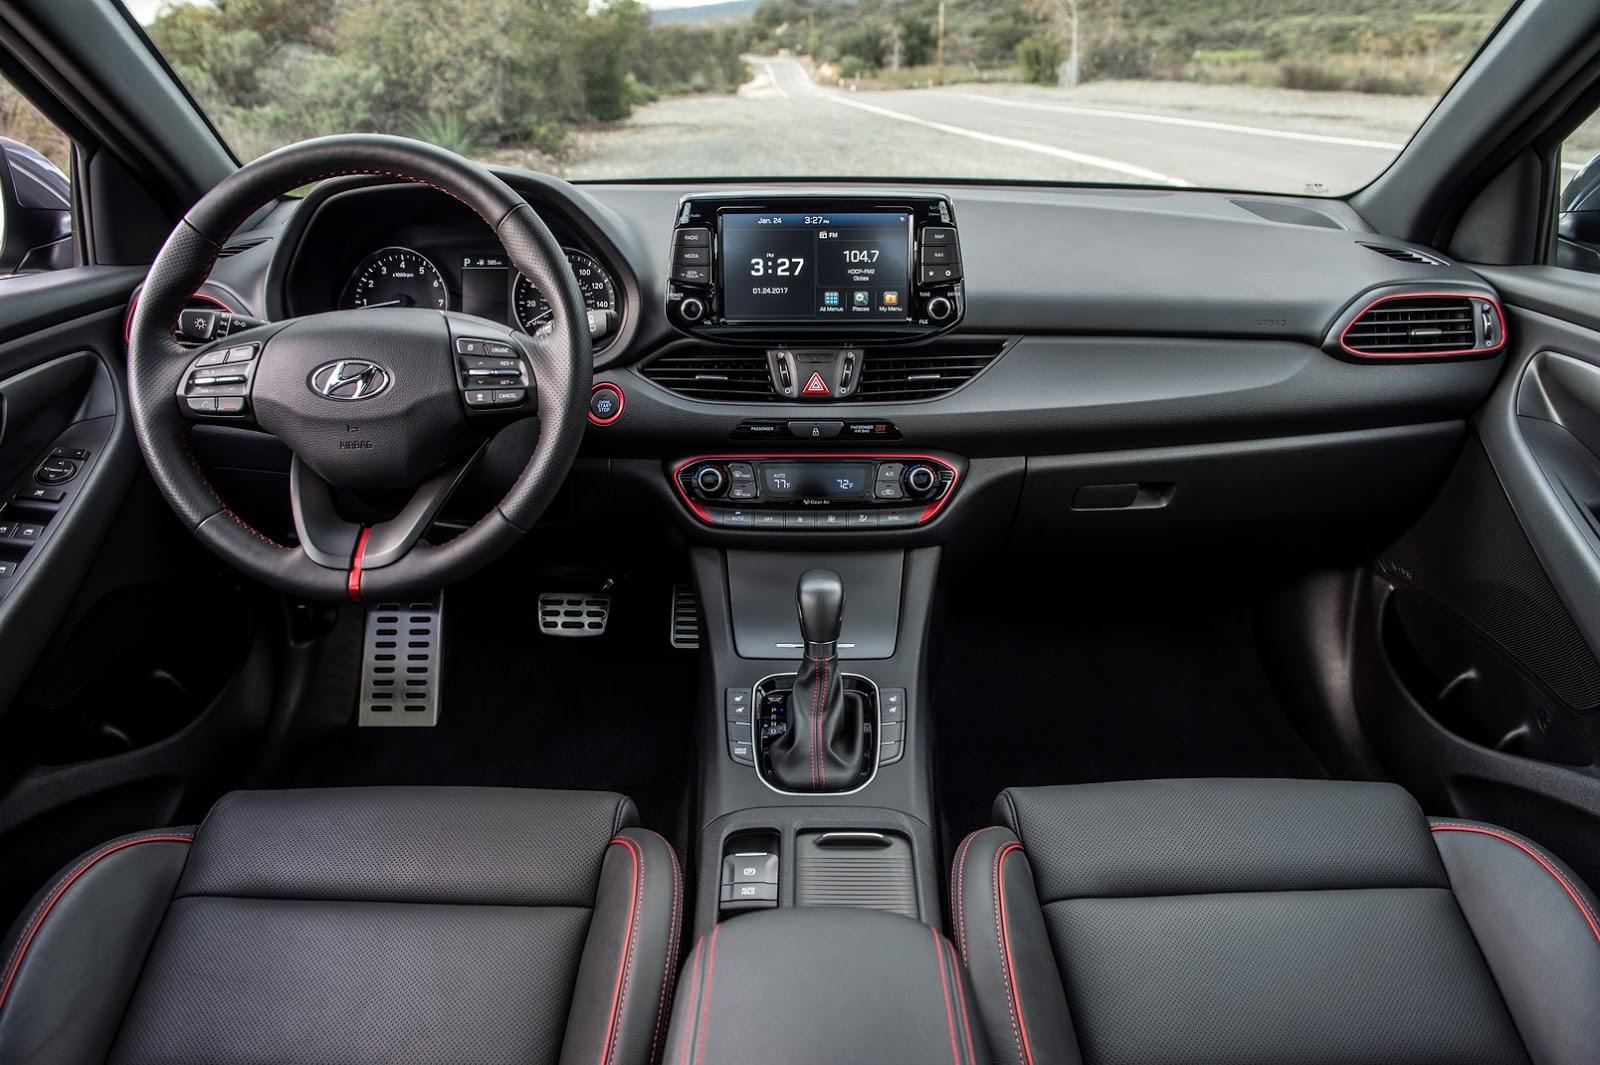 Hyundai Elantra GT cabine